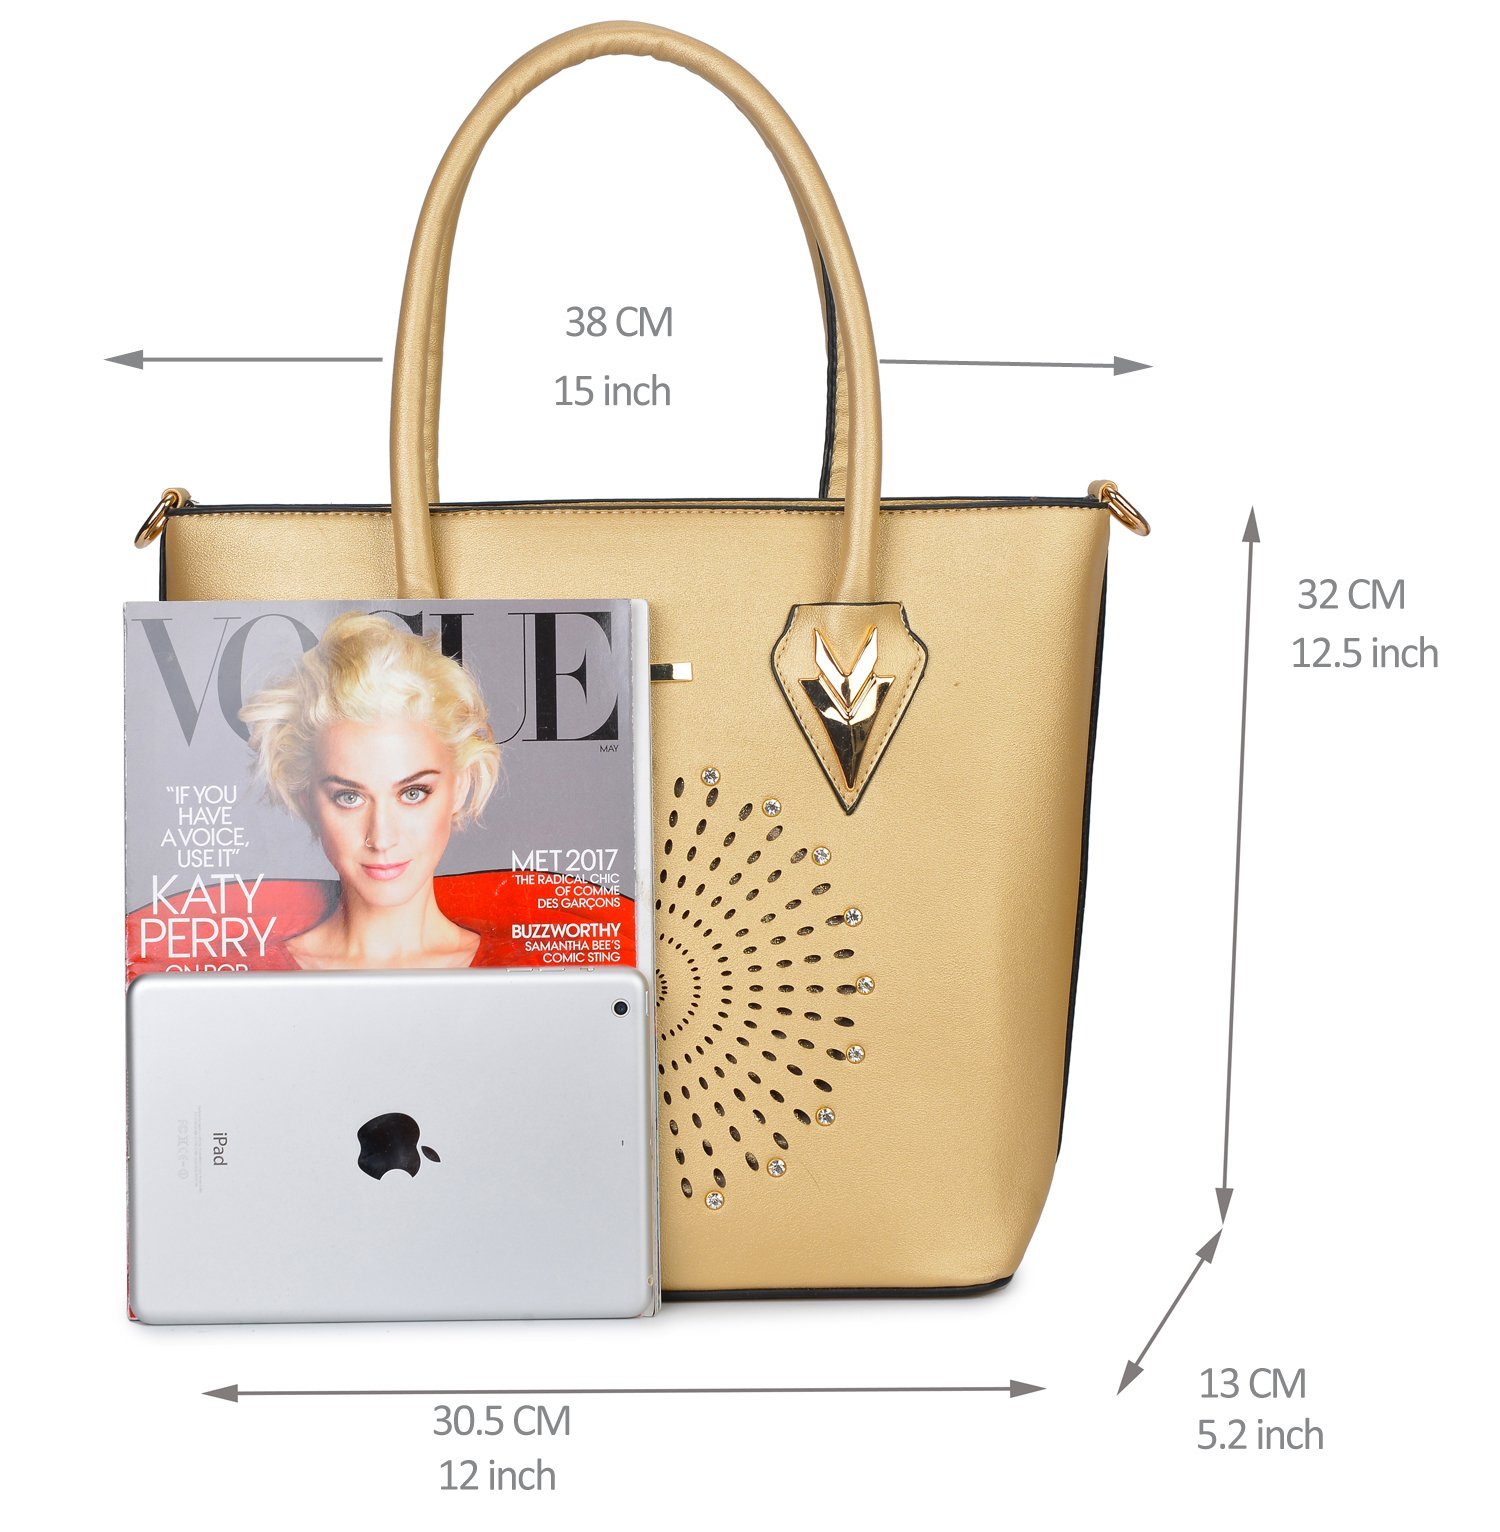 Women Handbag Purse Hobo Faux Leather Messenger Bag Clutch Satchel Bag 3 Piece Gift Set by KasPala (Image #7)